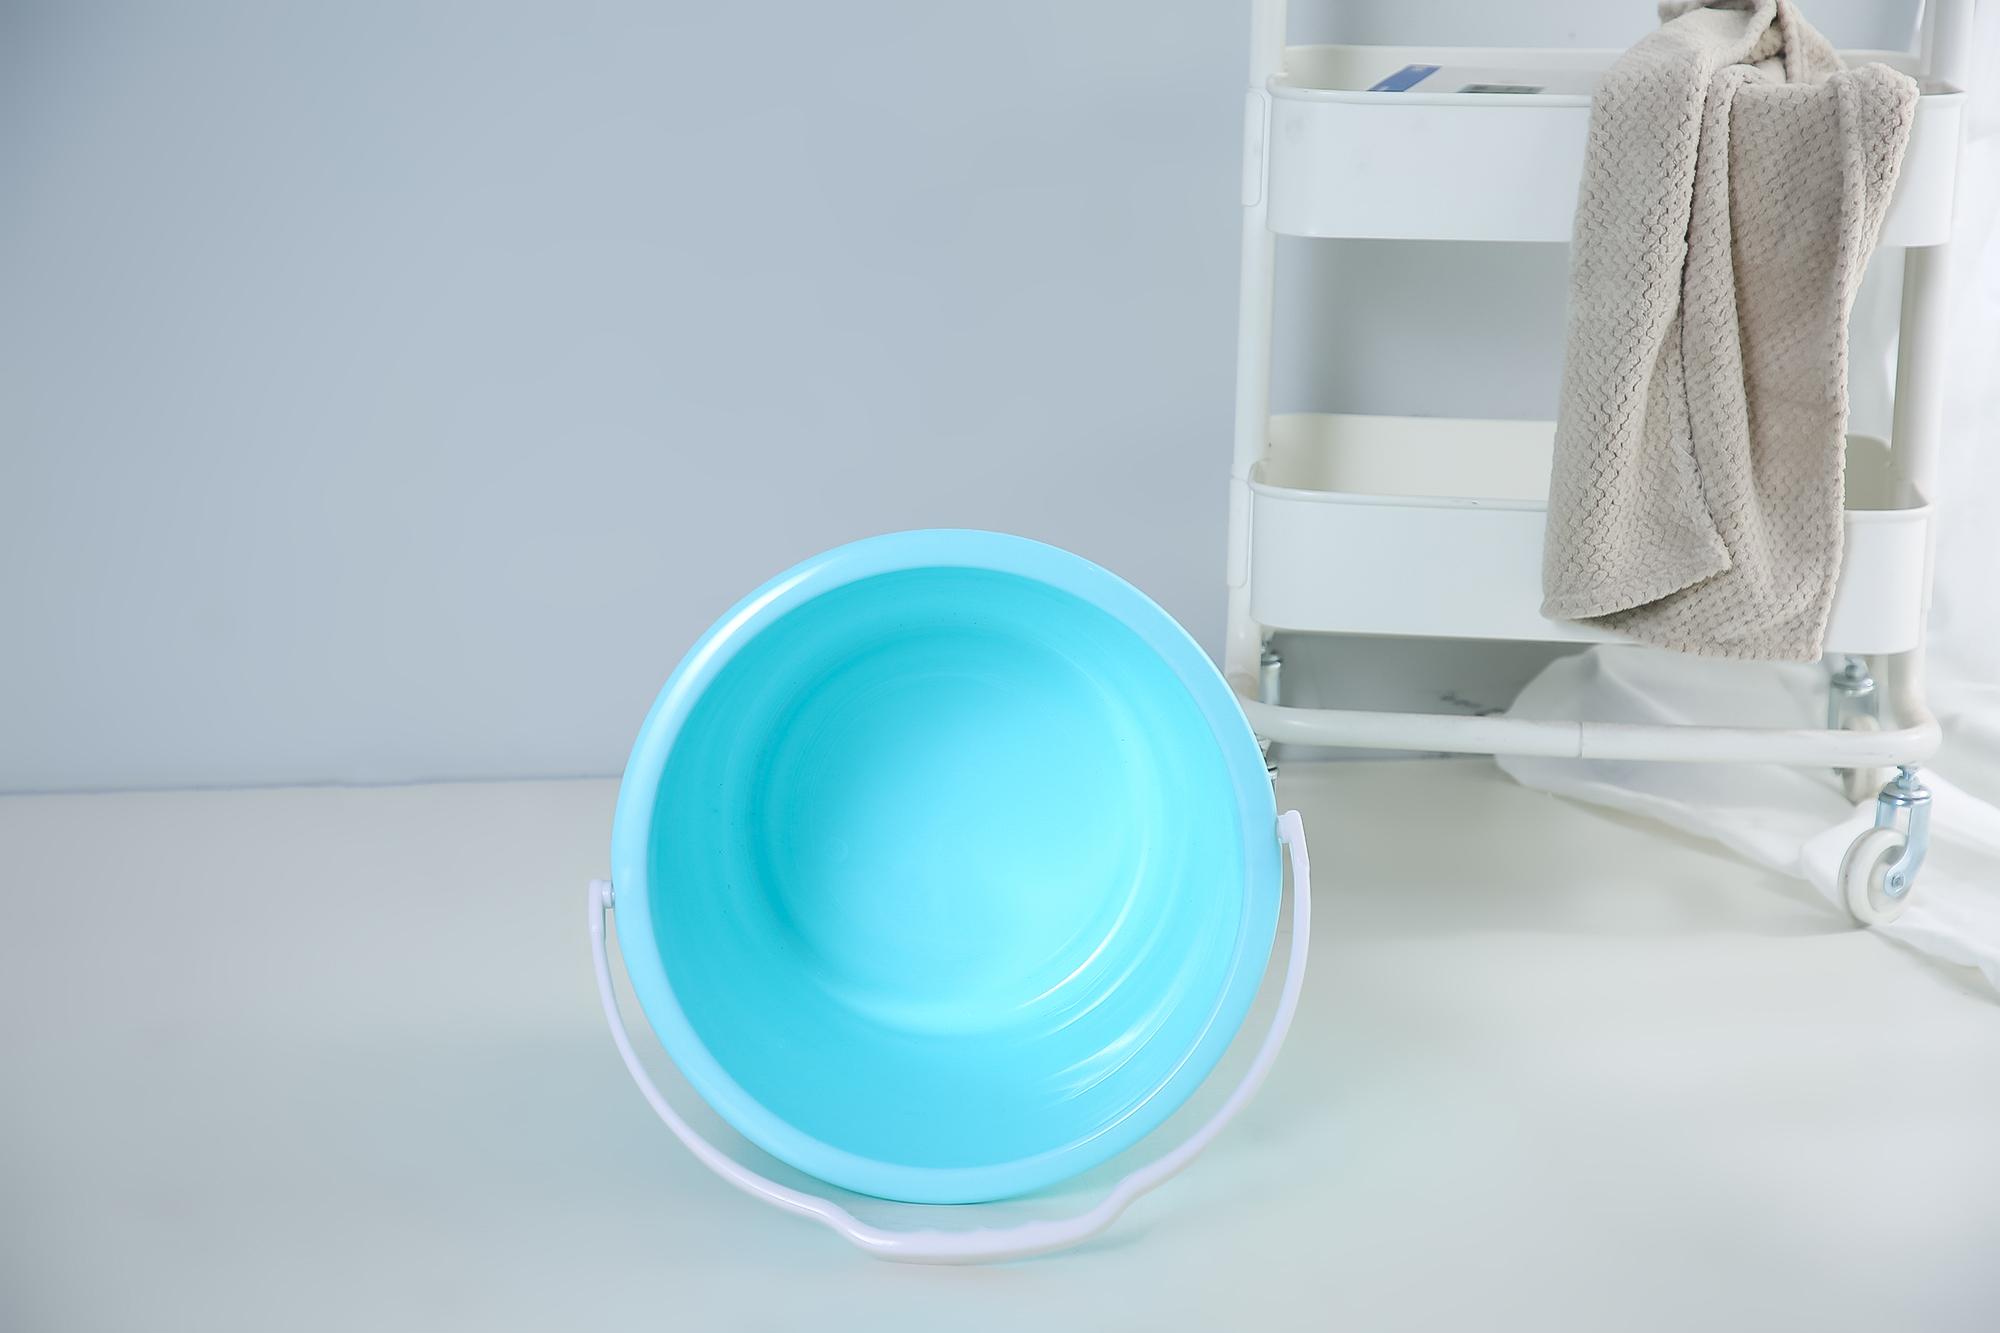 1236水桶-1236淺色-2E0A2134